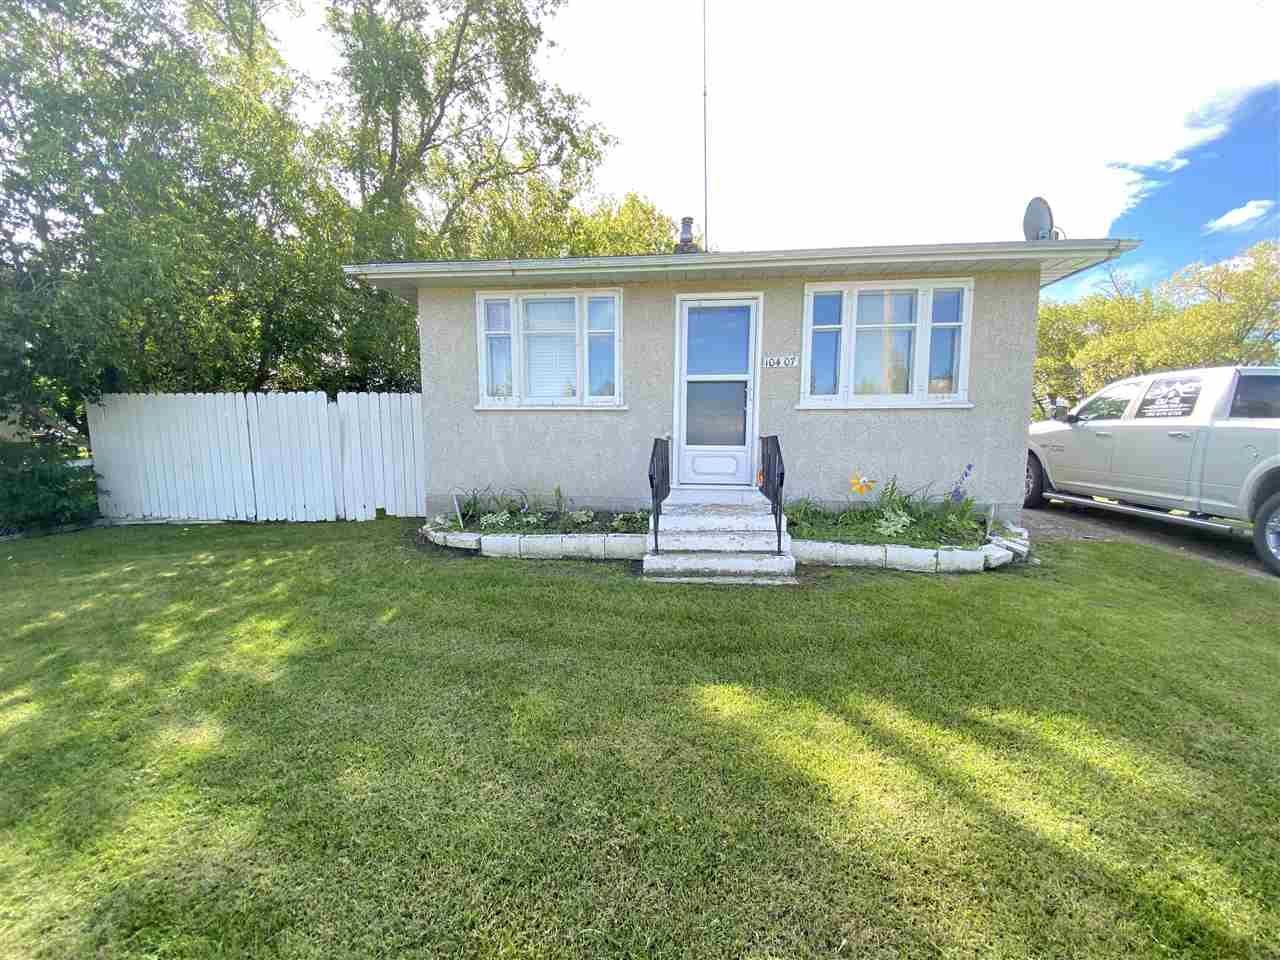 Main Photo: 10407 103 Street: Westlock House for sale : MLS®# E4213009